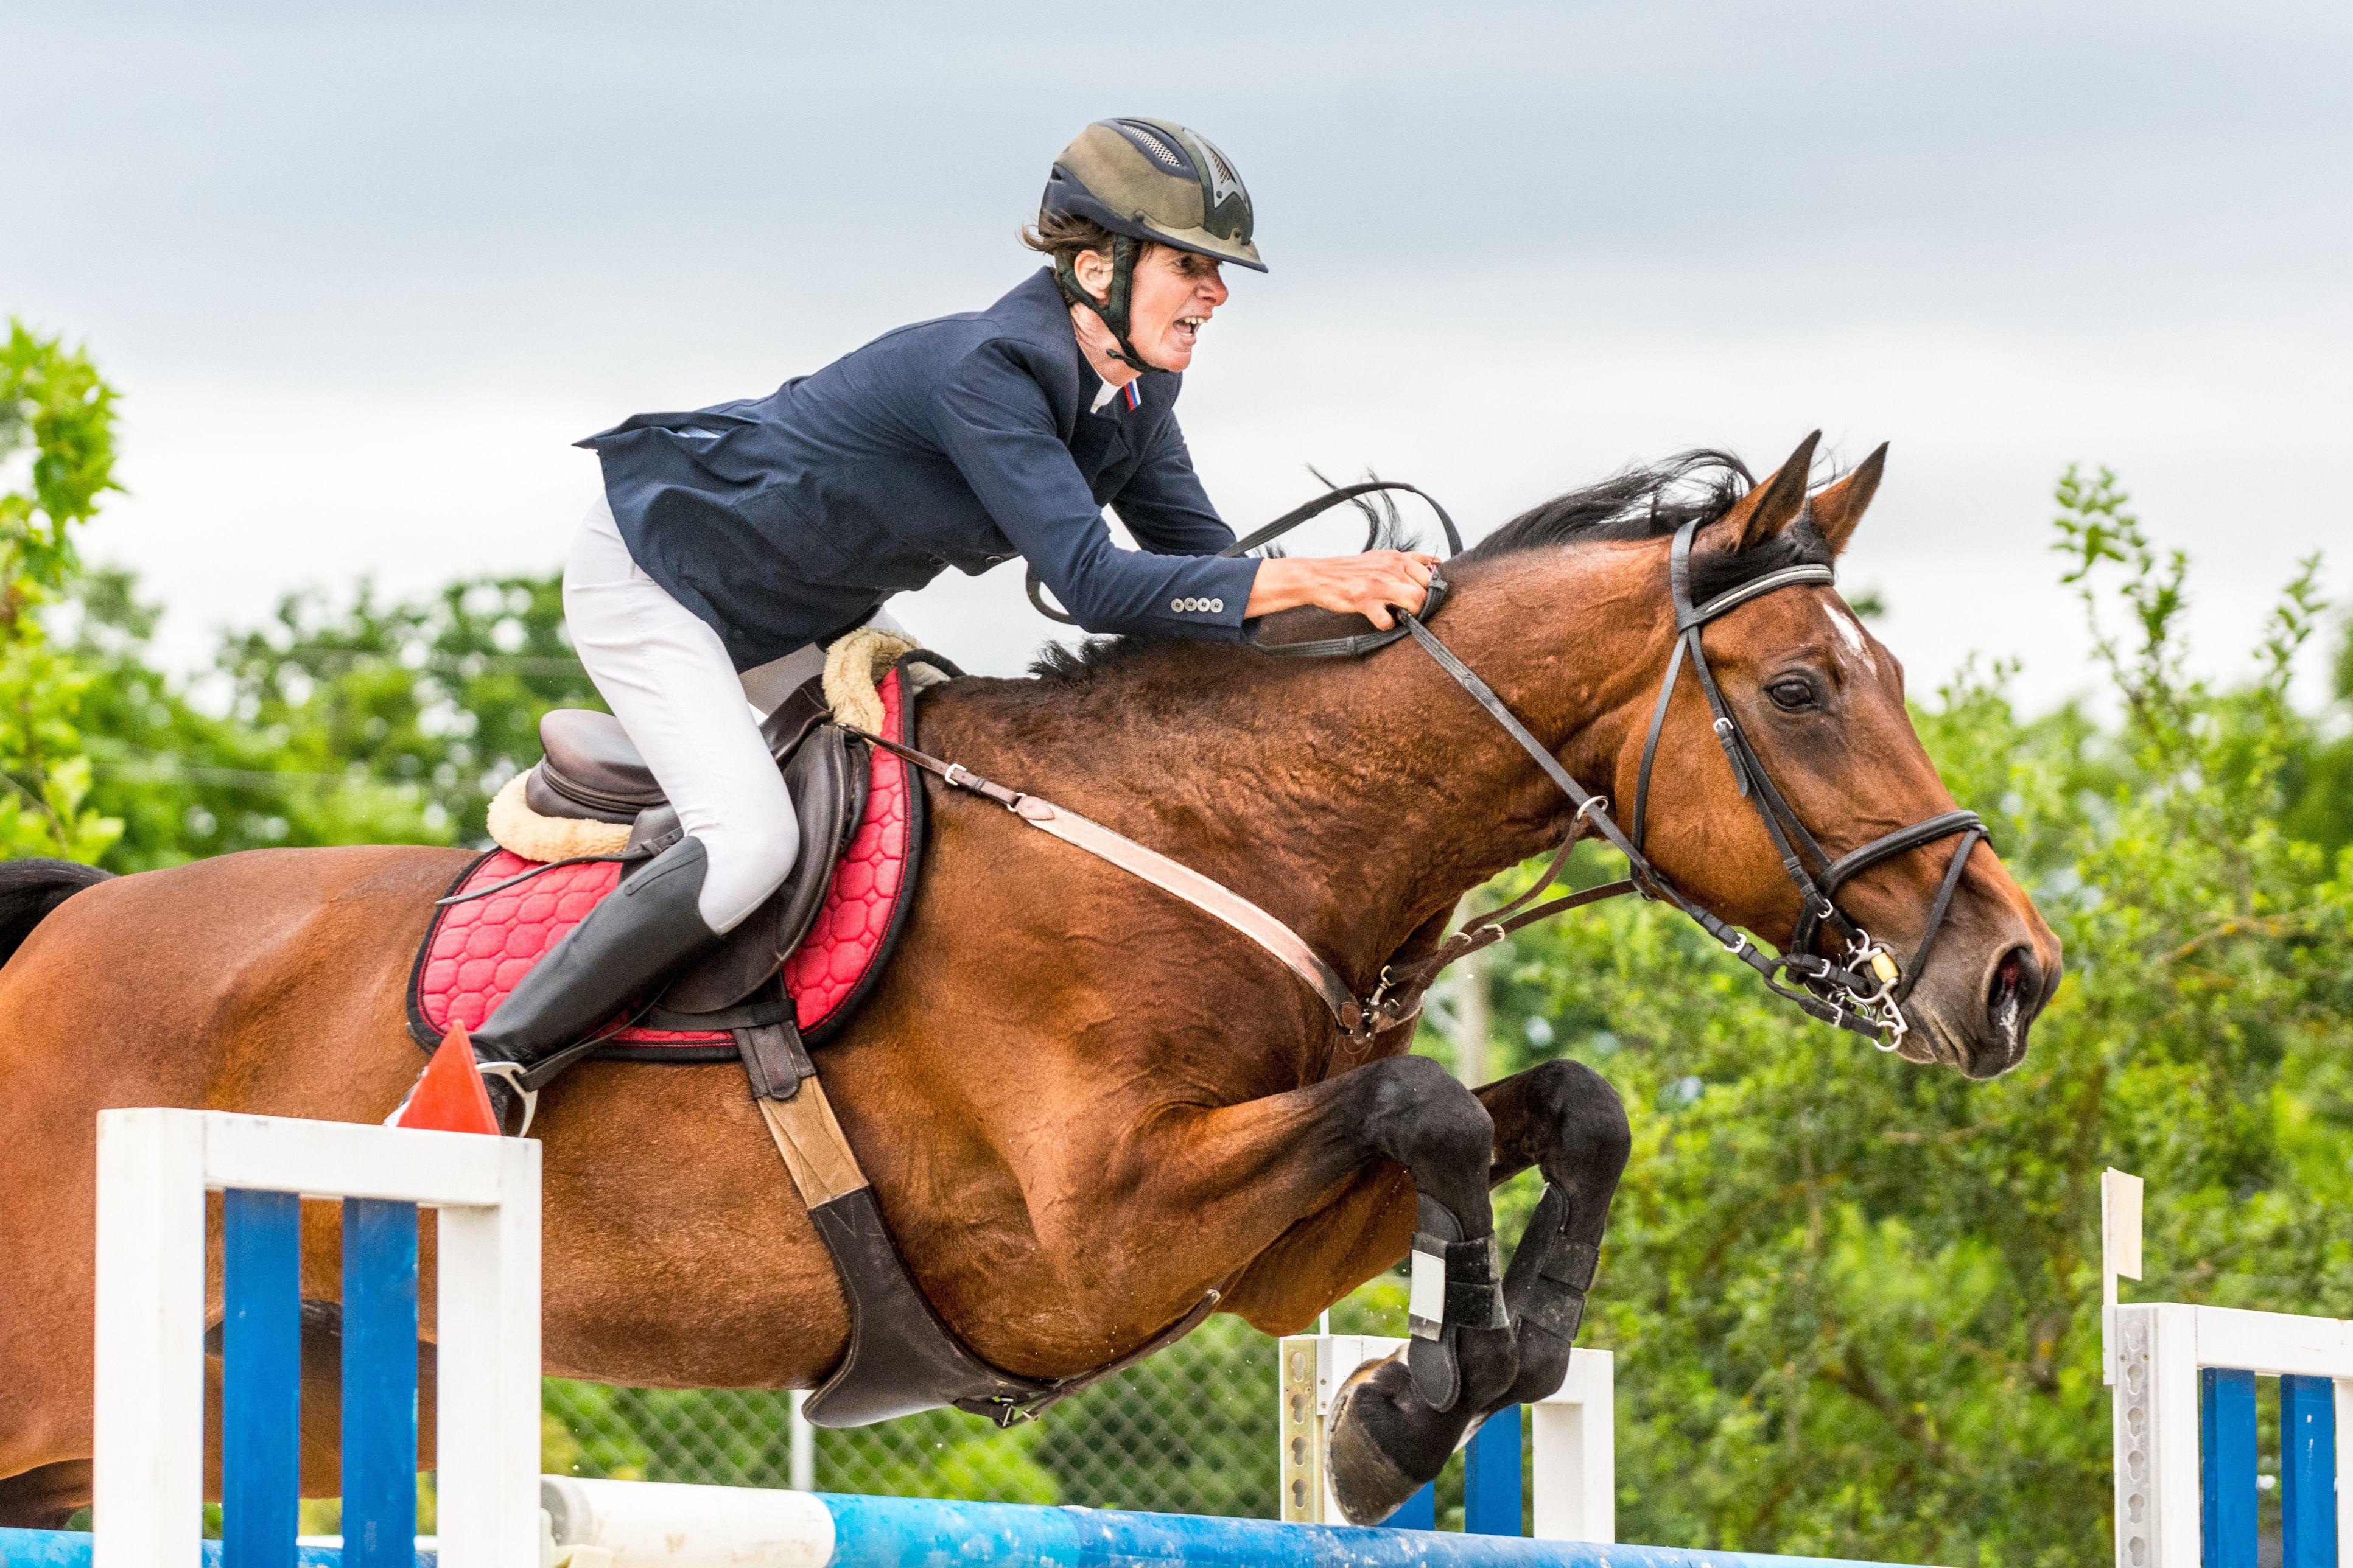 Un caballo con un jinete saltando sobre un obstáculo.